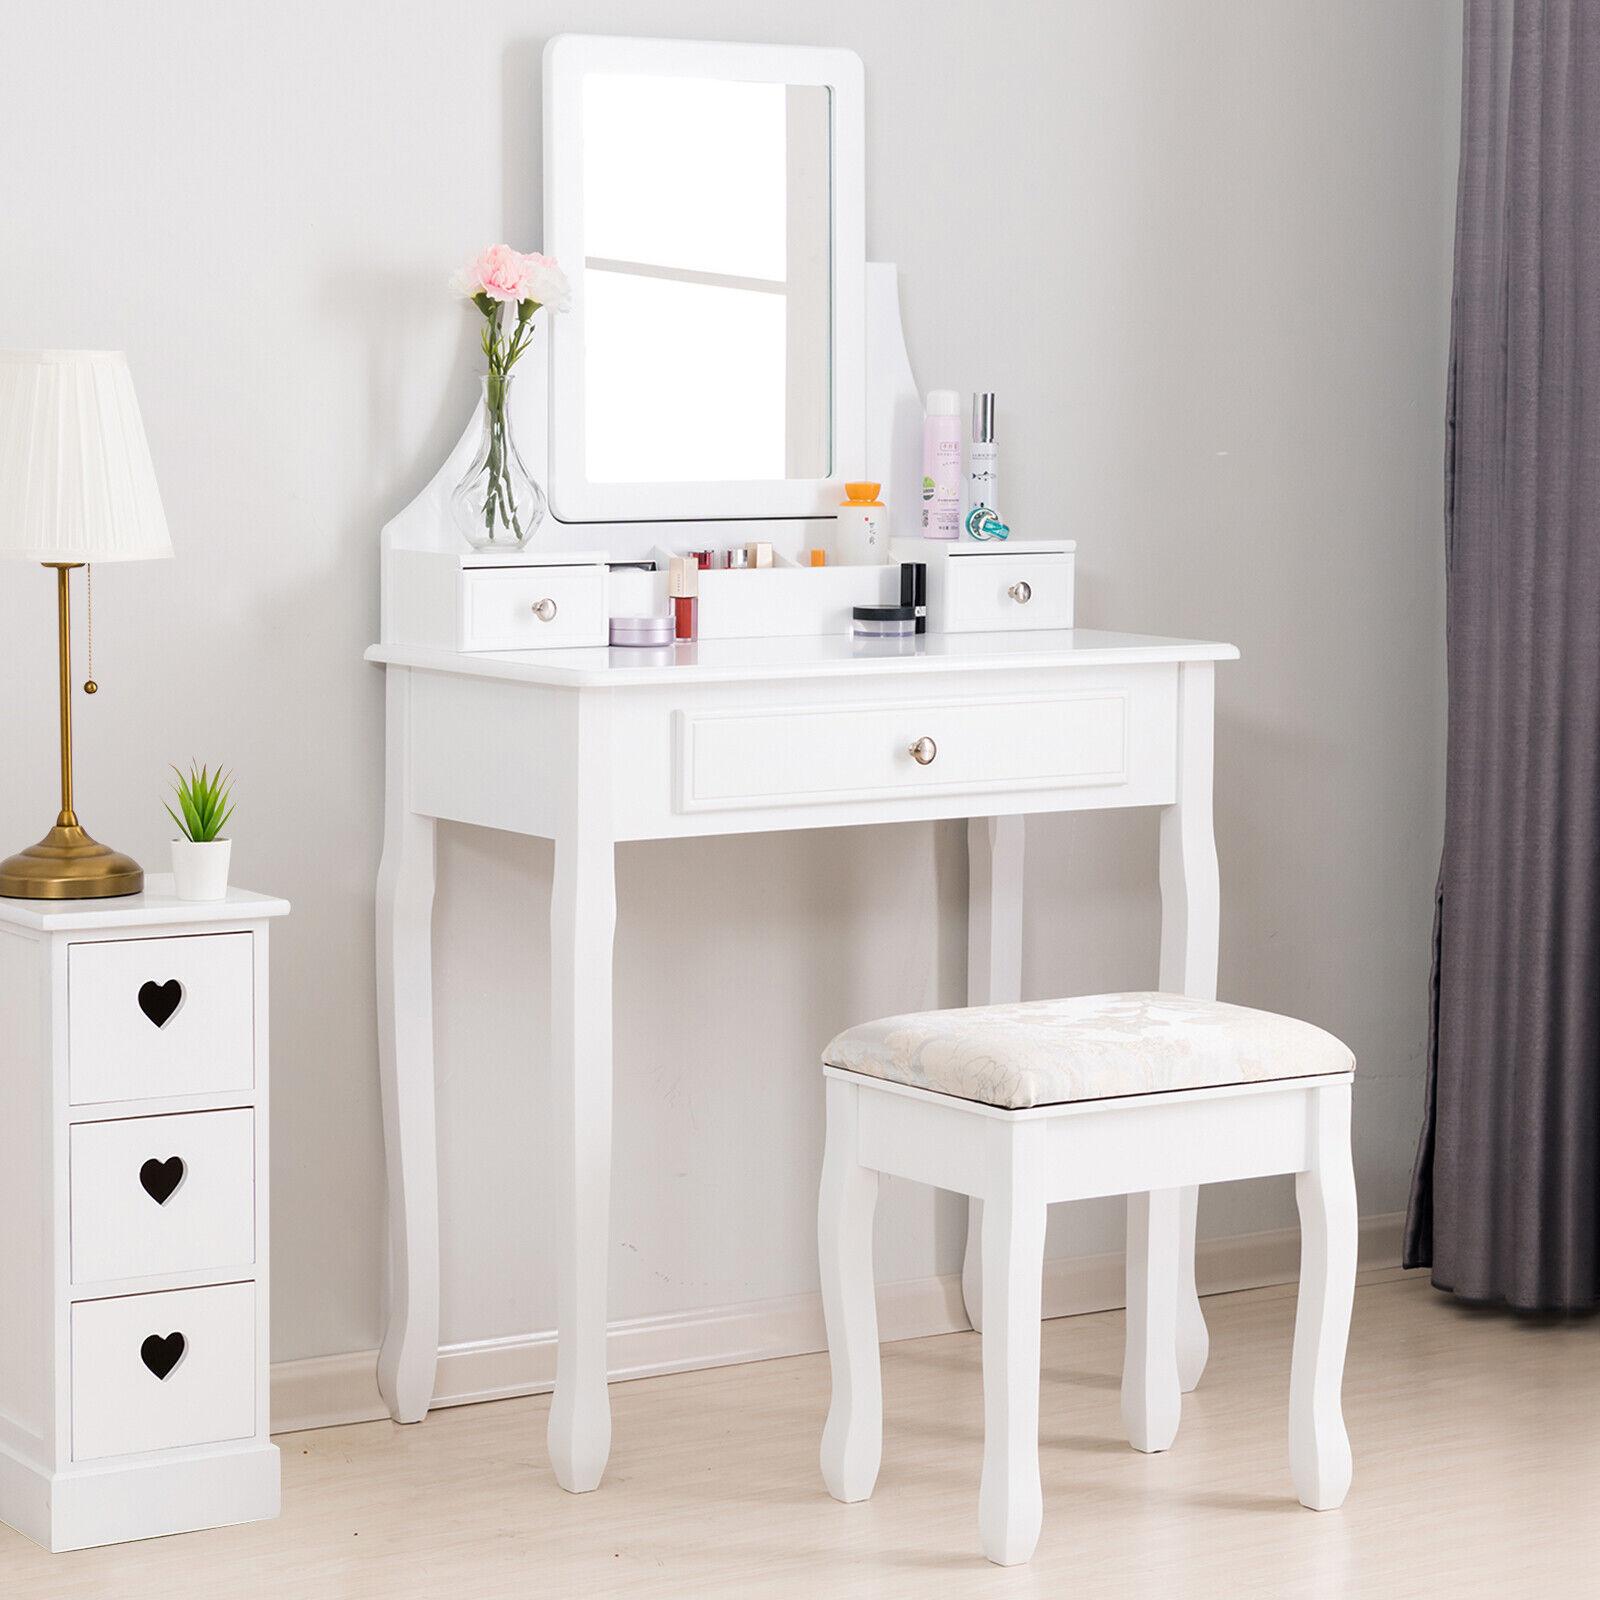 Elegant Wood Dressing Table Set Vanity Desk W 3 Drawers Stool